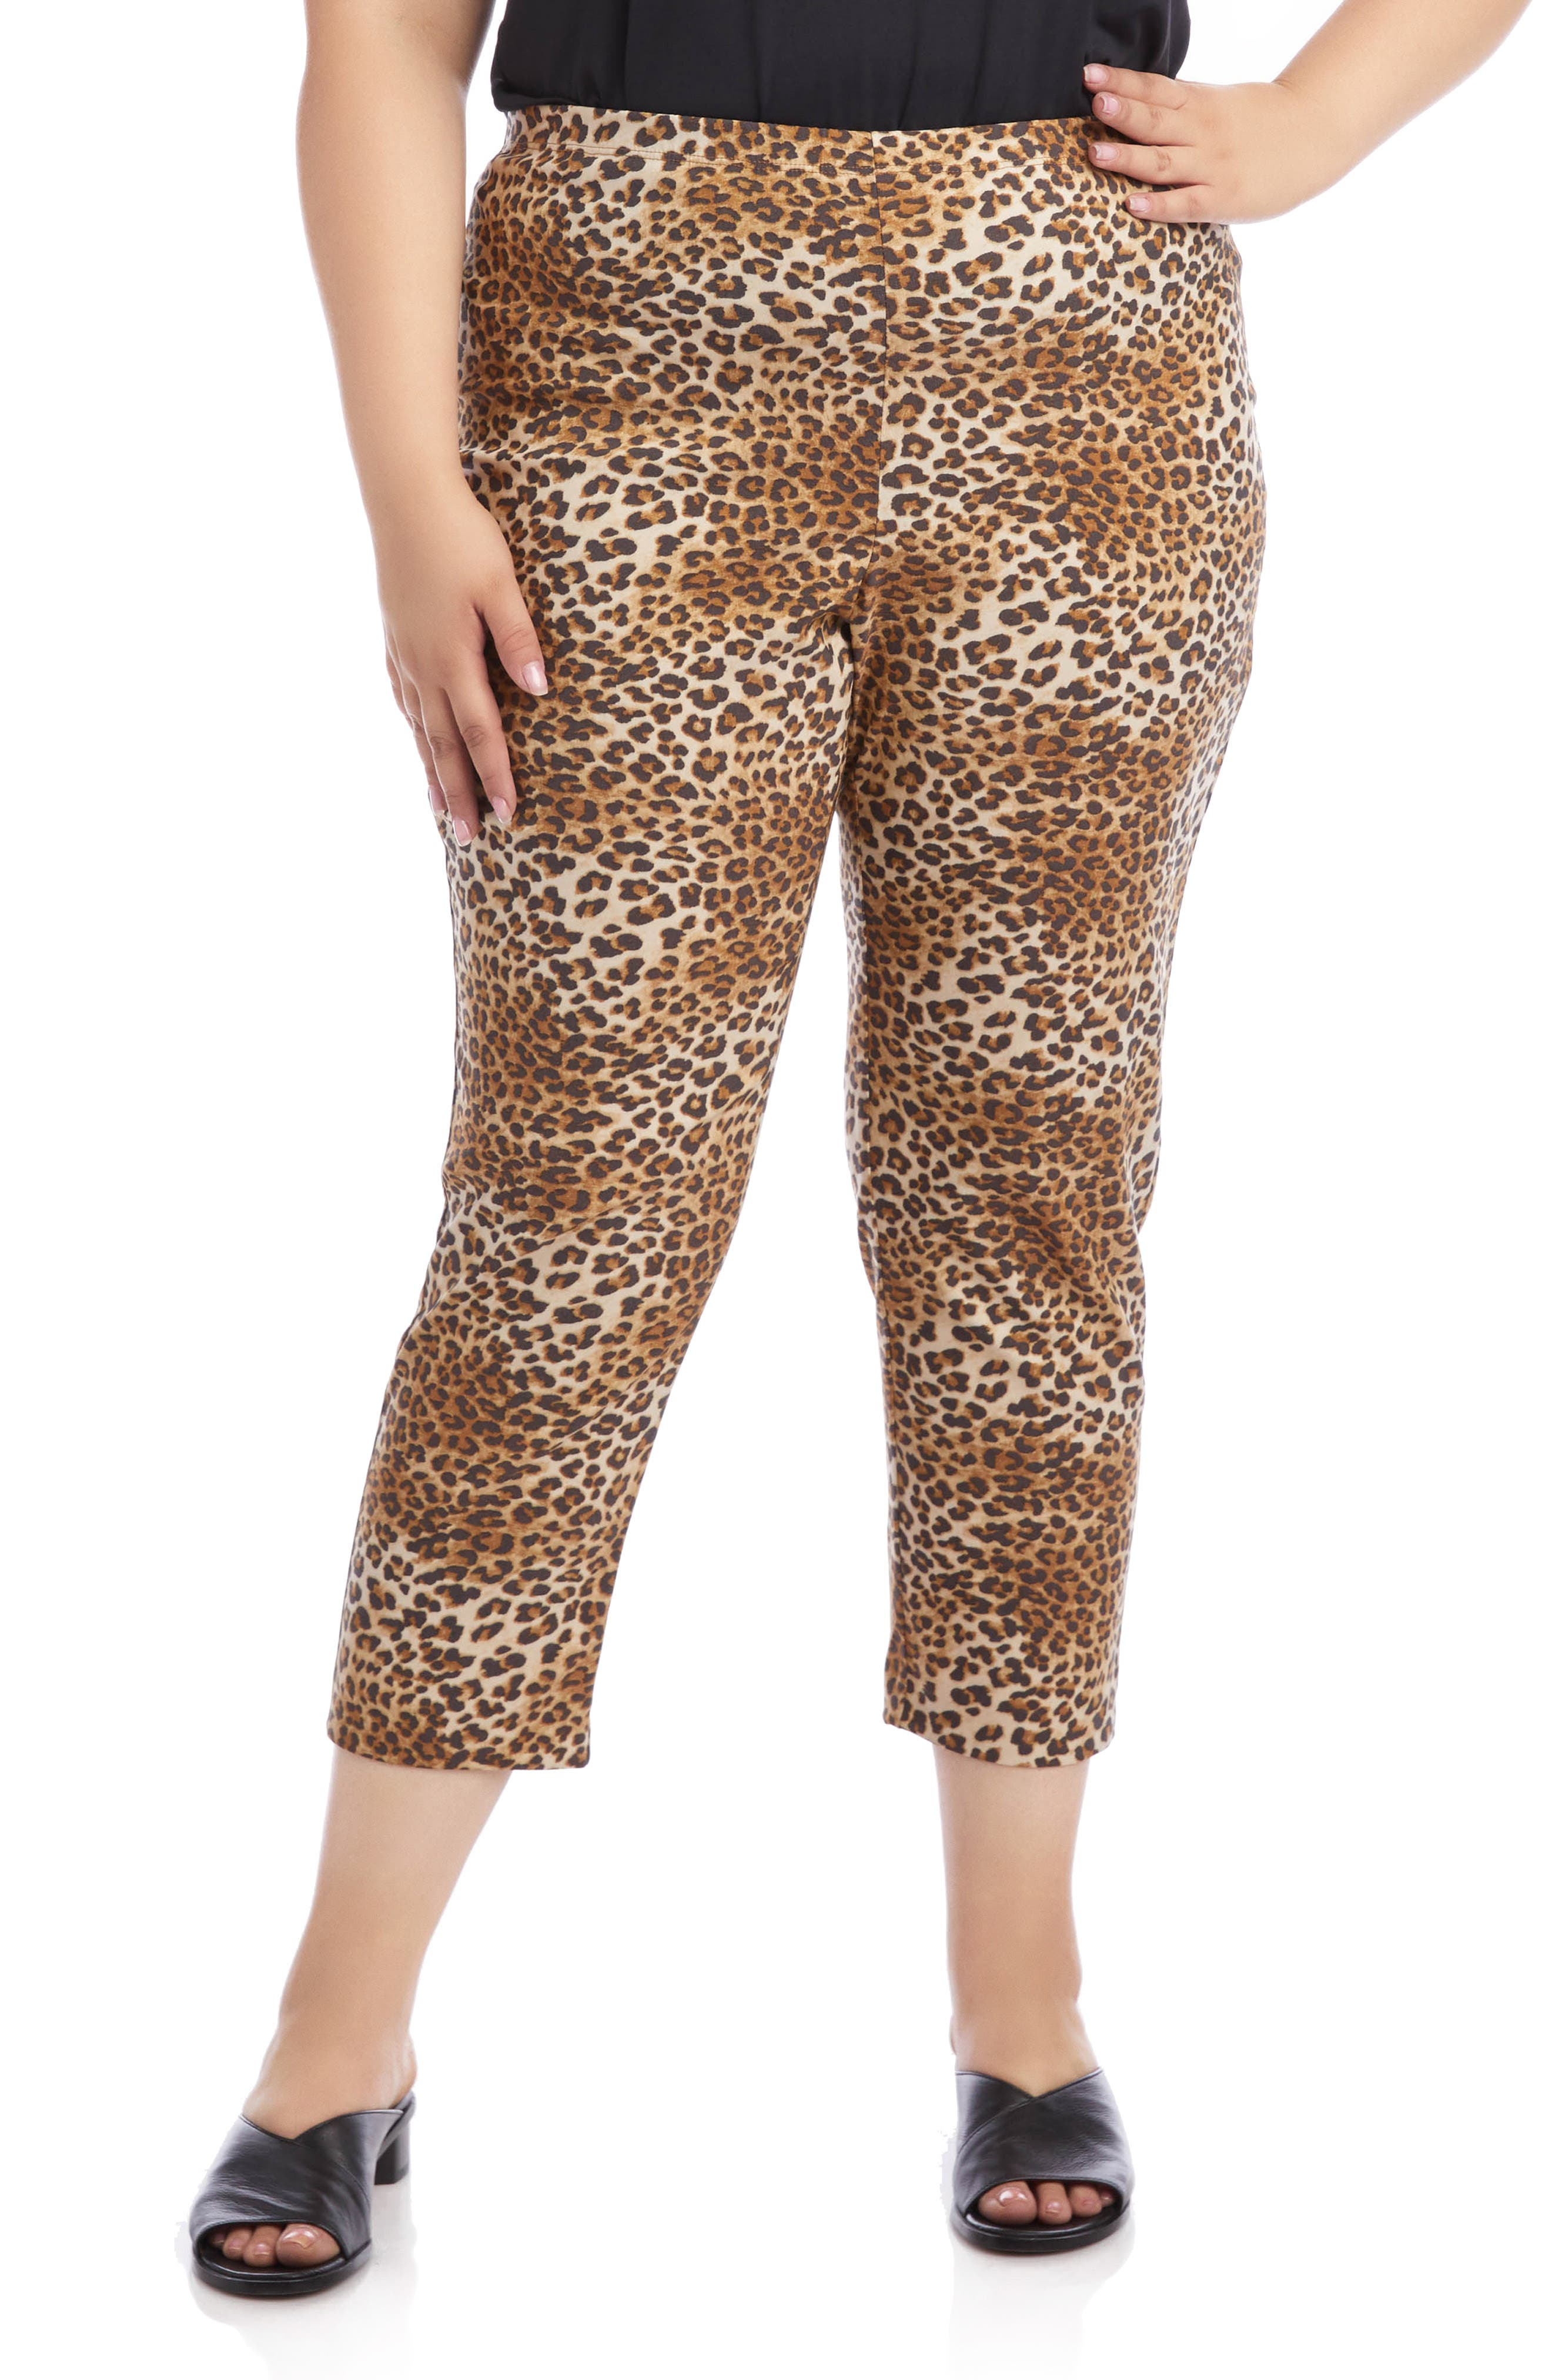 Image of Karen Kane Leopard Print Pull-On Piper Pants